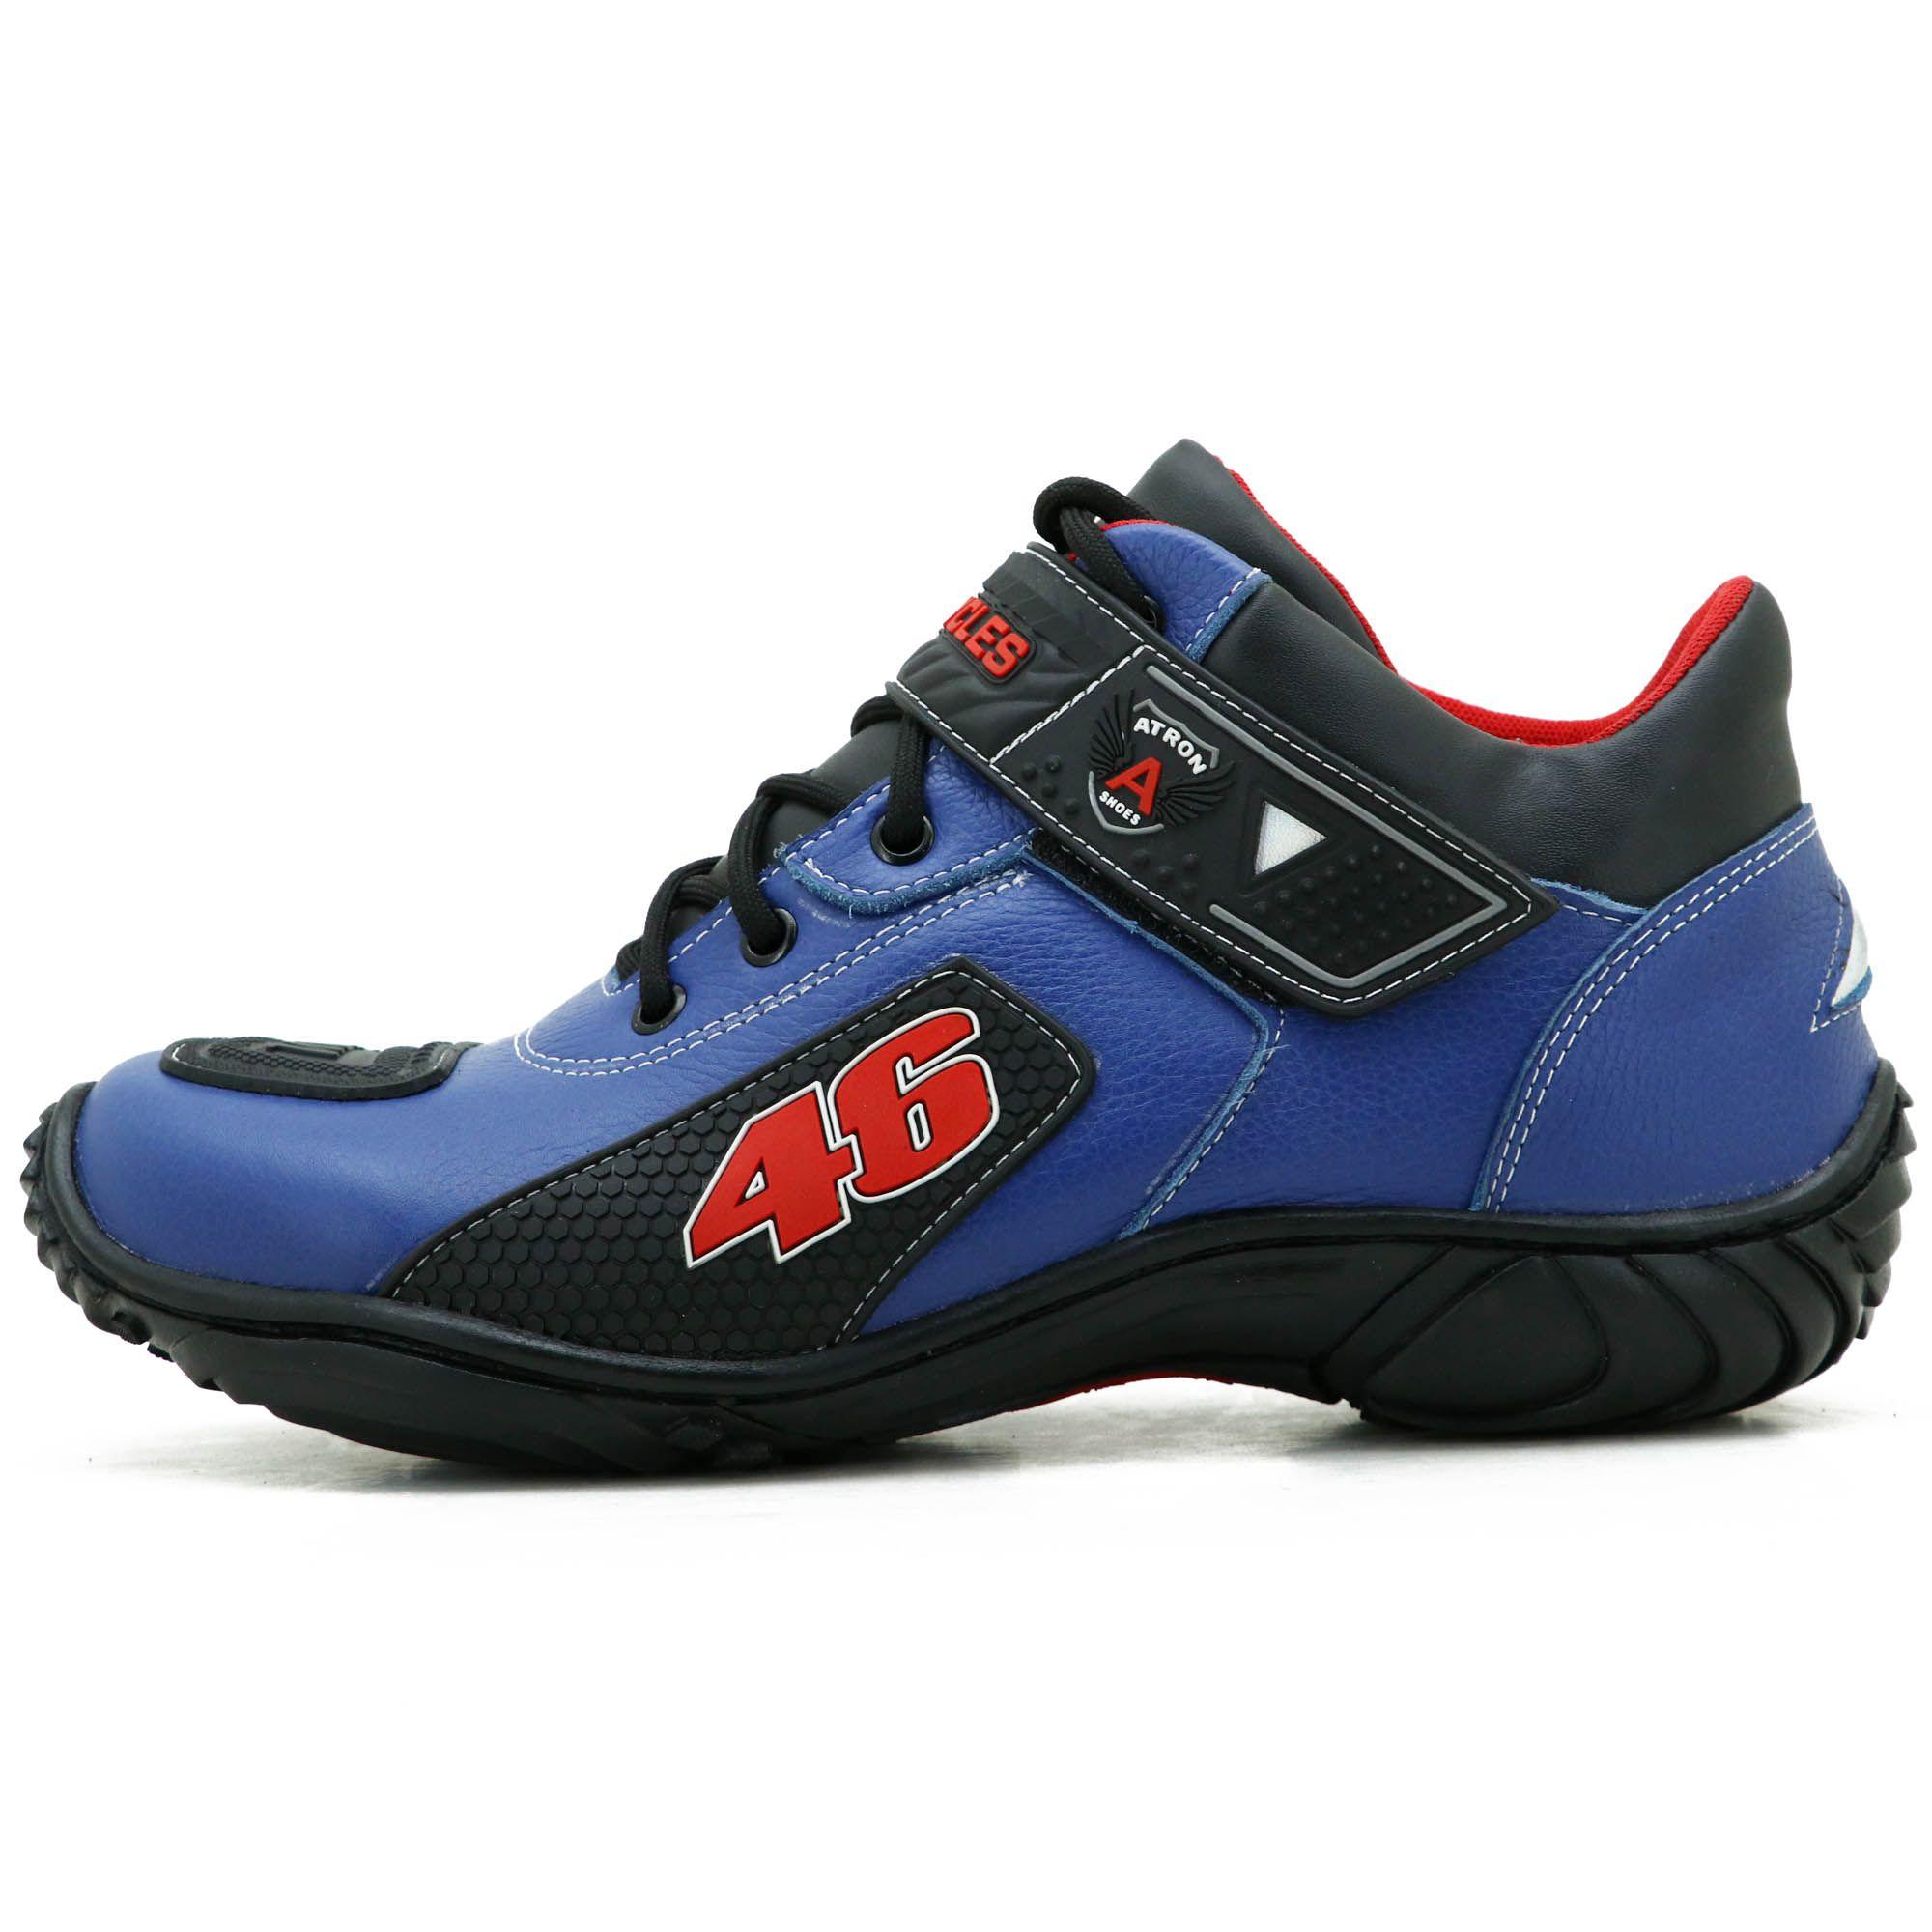 Bota motociclista Valentino Rossi azul 46